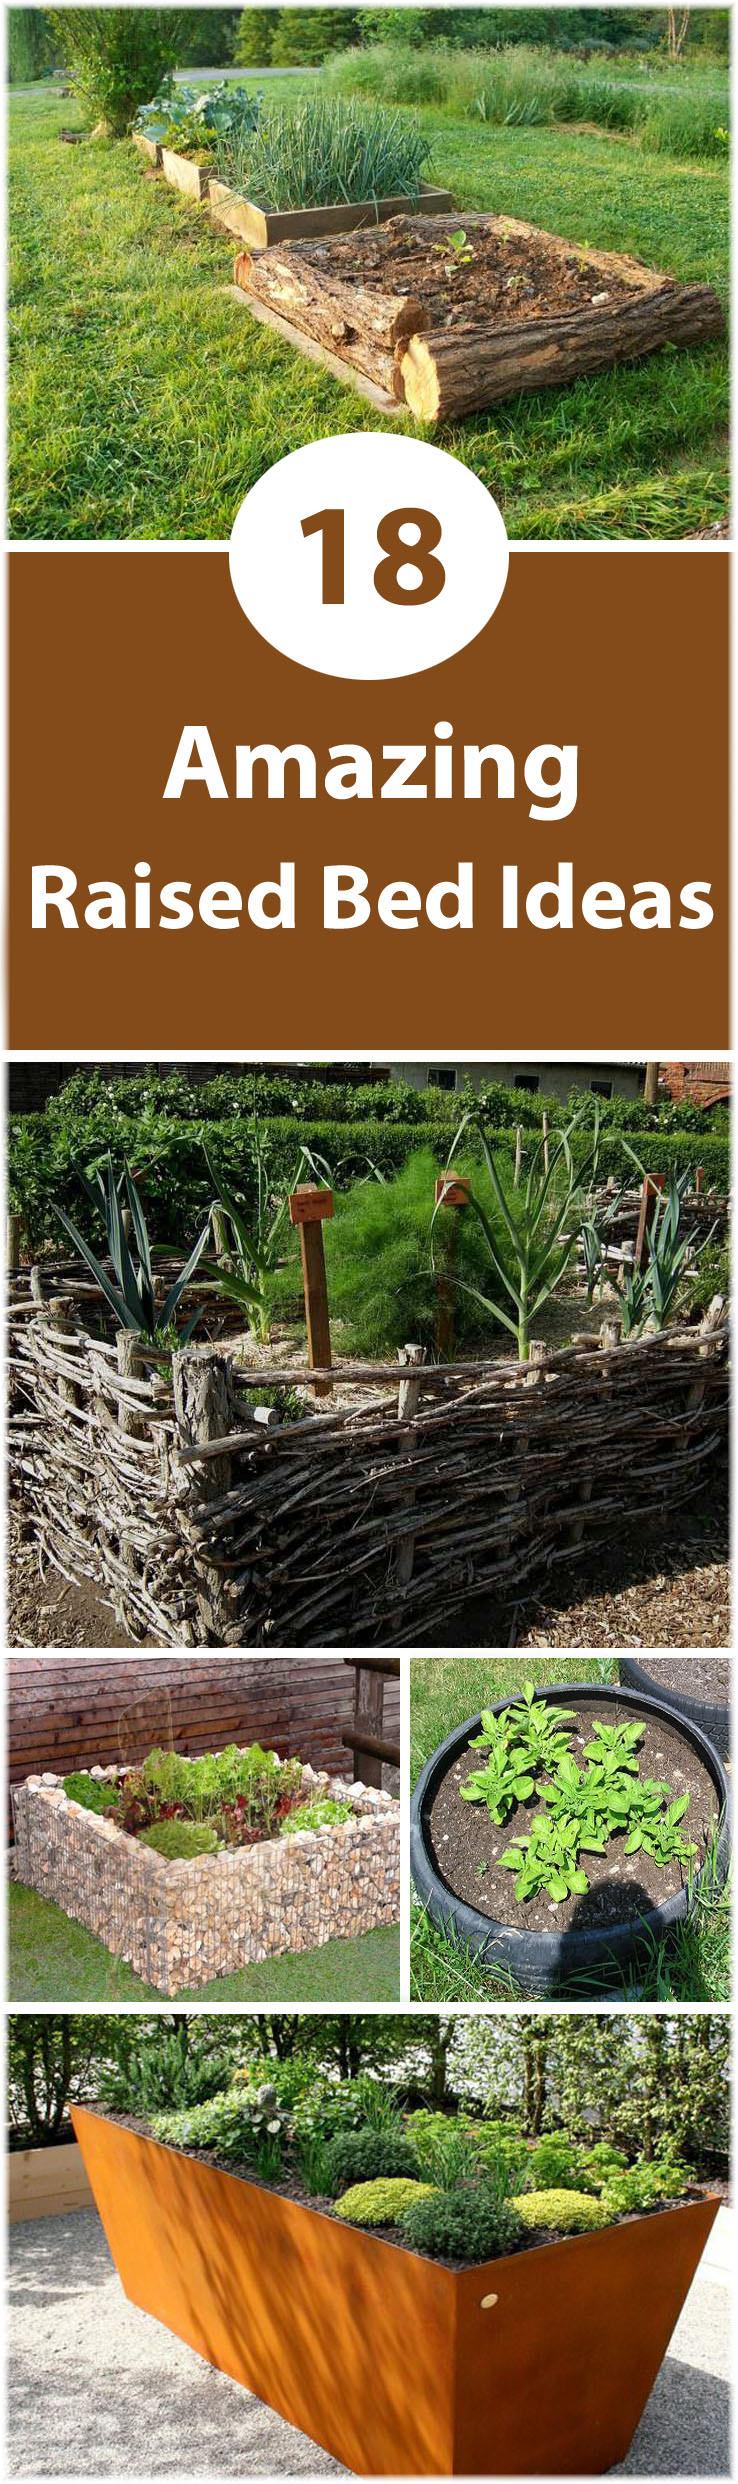 18 Great Raised Bed Ideas   Raised Bed Gardening   Balcony ... on Backyard Raised Garden Bed Ideas id=57832